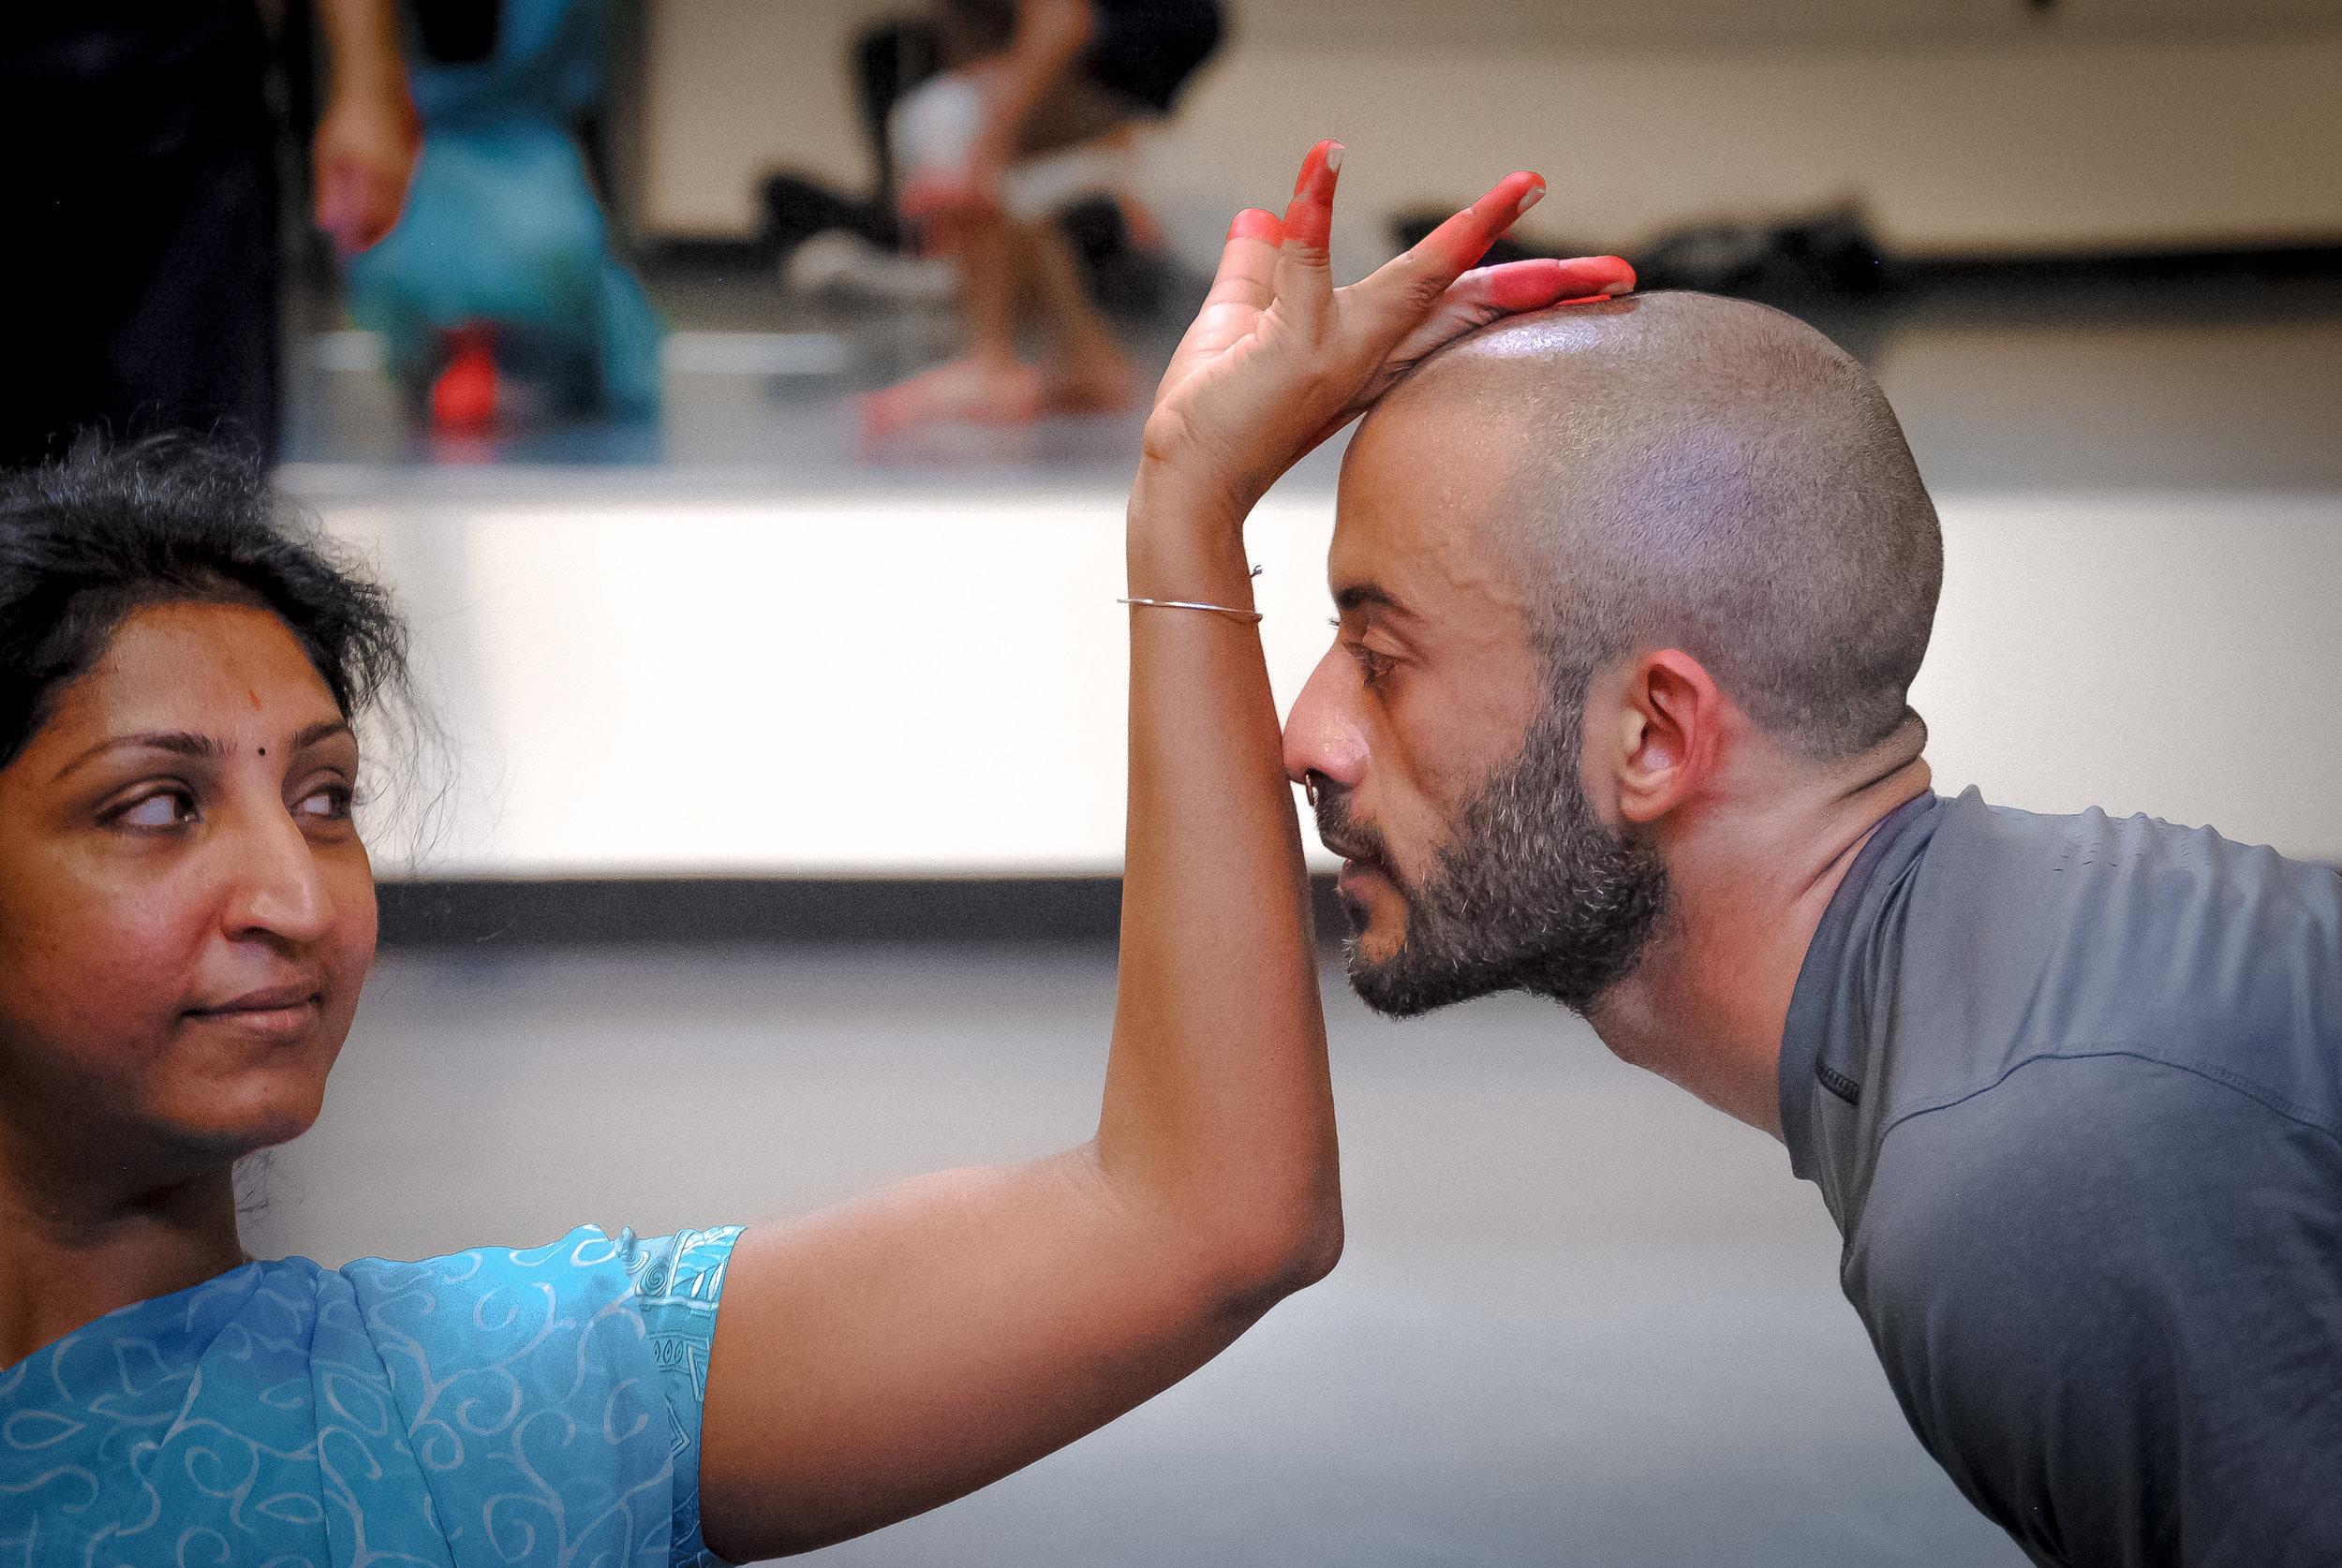 Bhuvana & Chadi El-Khoury in rehearsal.